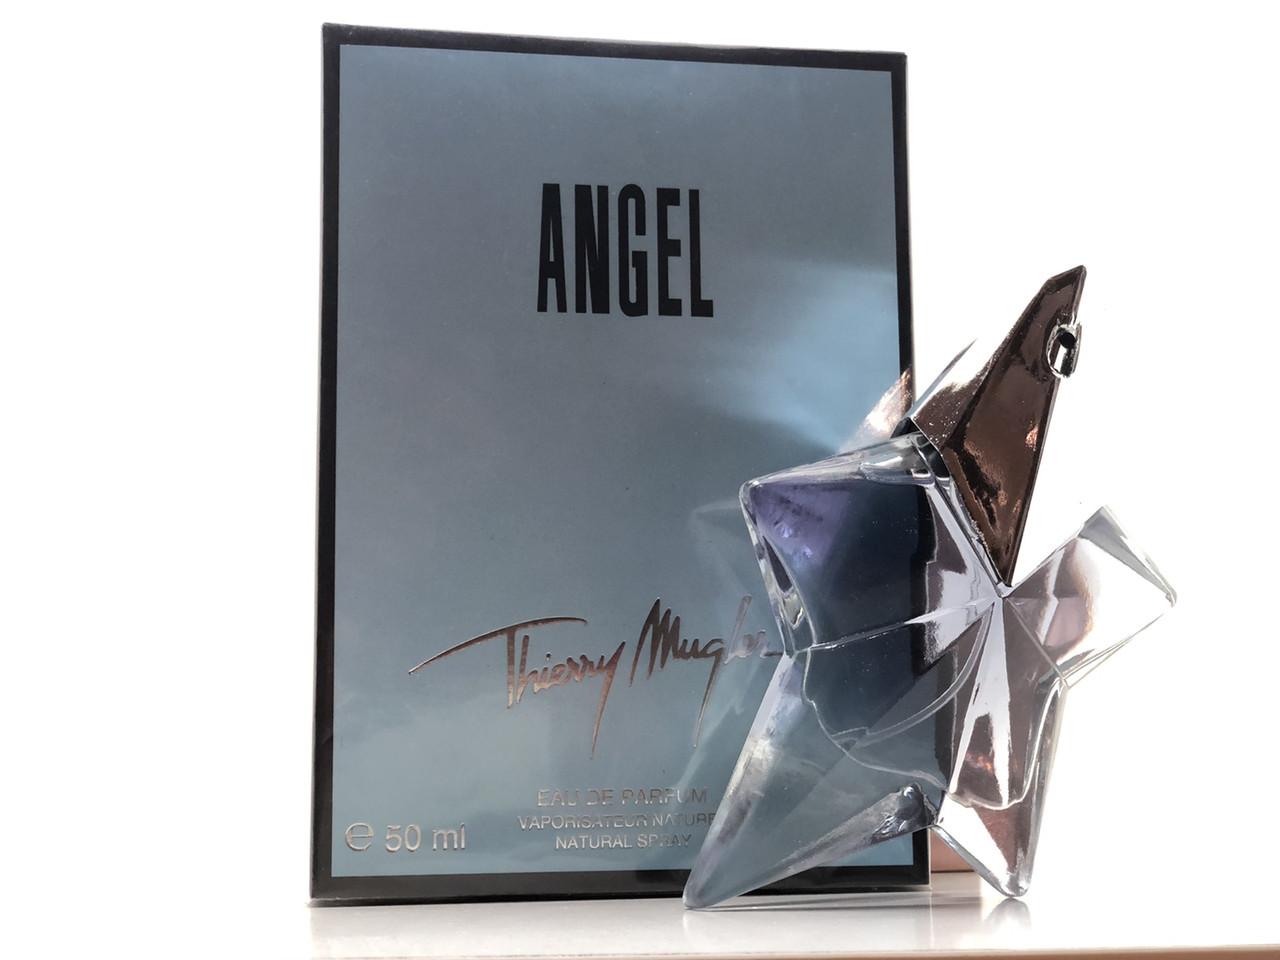 Женский парфюм Thierry Mugler Angel (Тьерри Мюглер Ангел) 50 мл